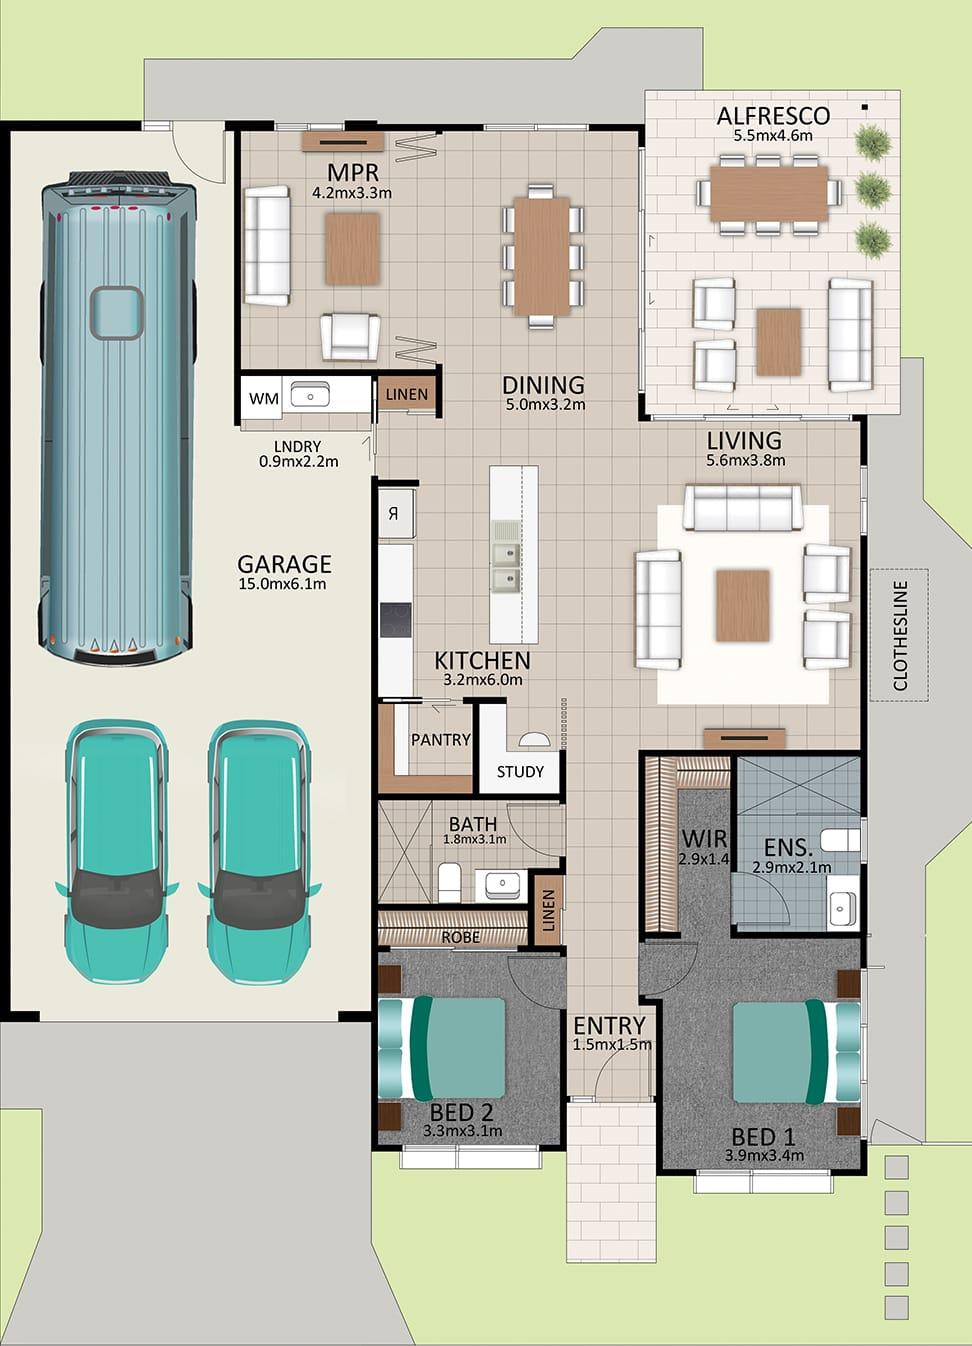 LR WEB LAT25 Floorplan LOT 182 Pepper NOV19 V1 - Lot 182